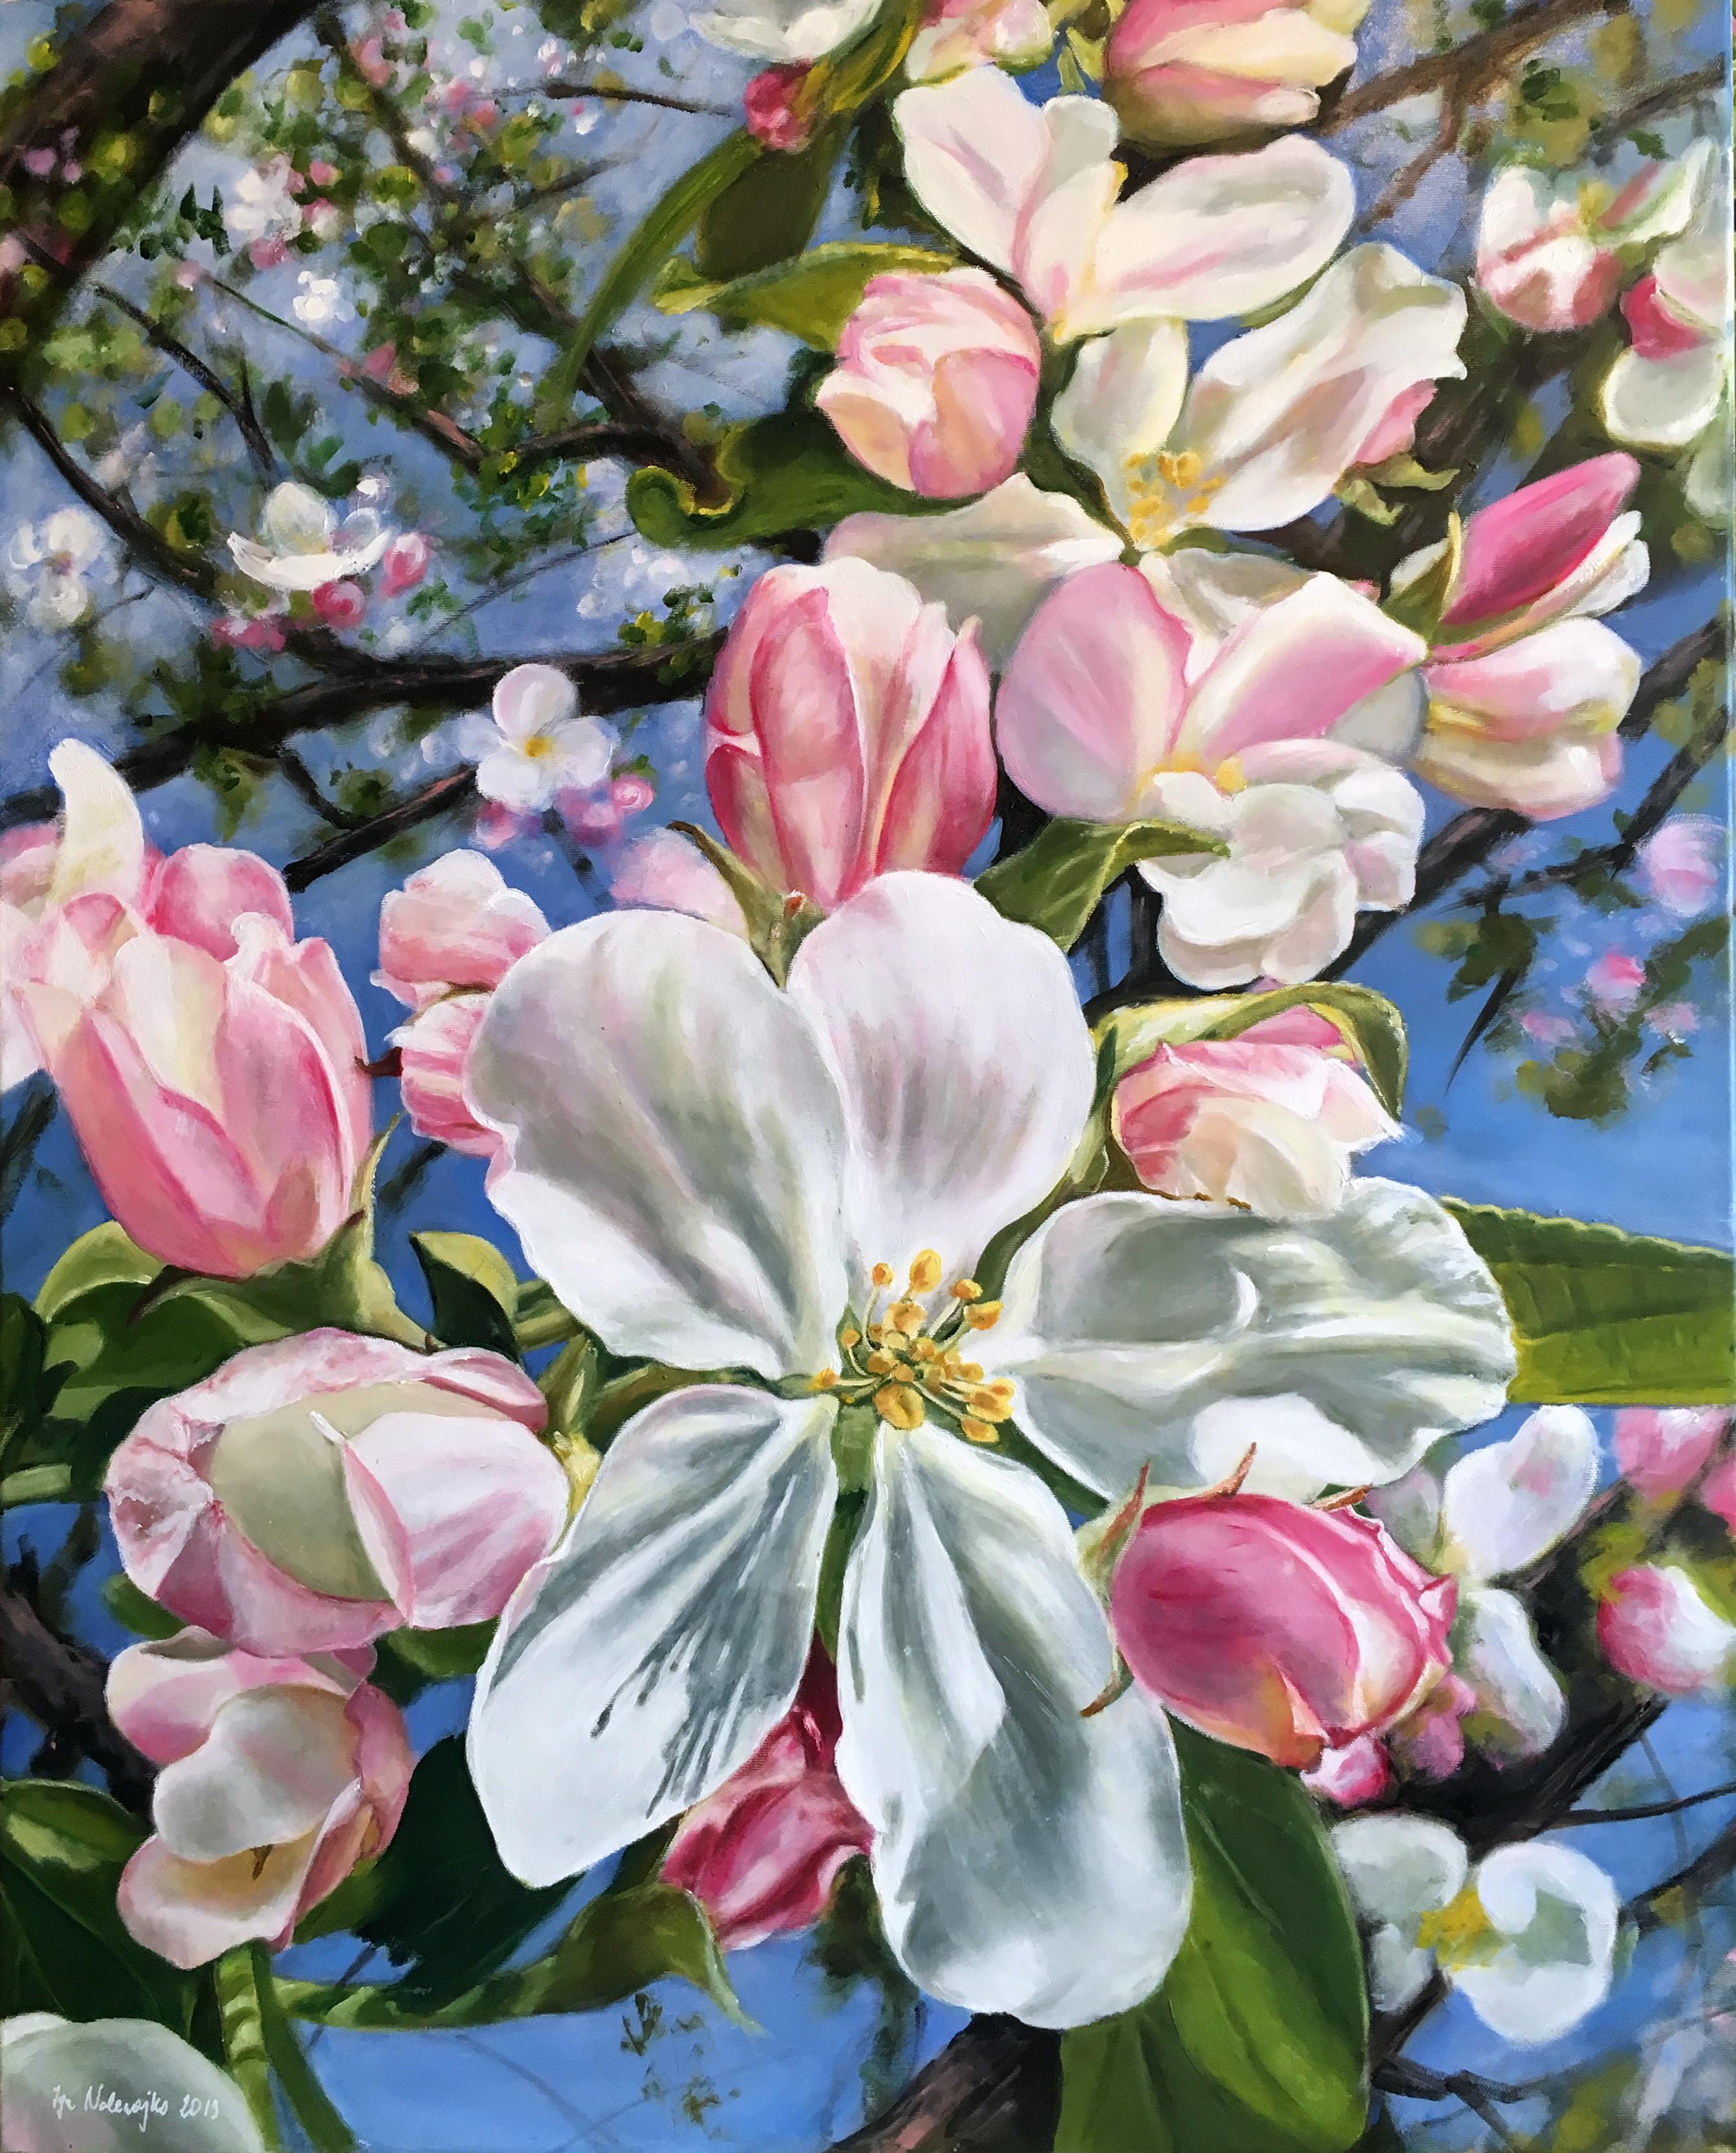 Jabłoń kwitnąca